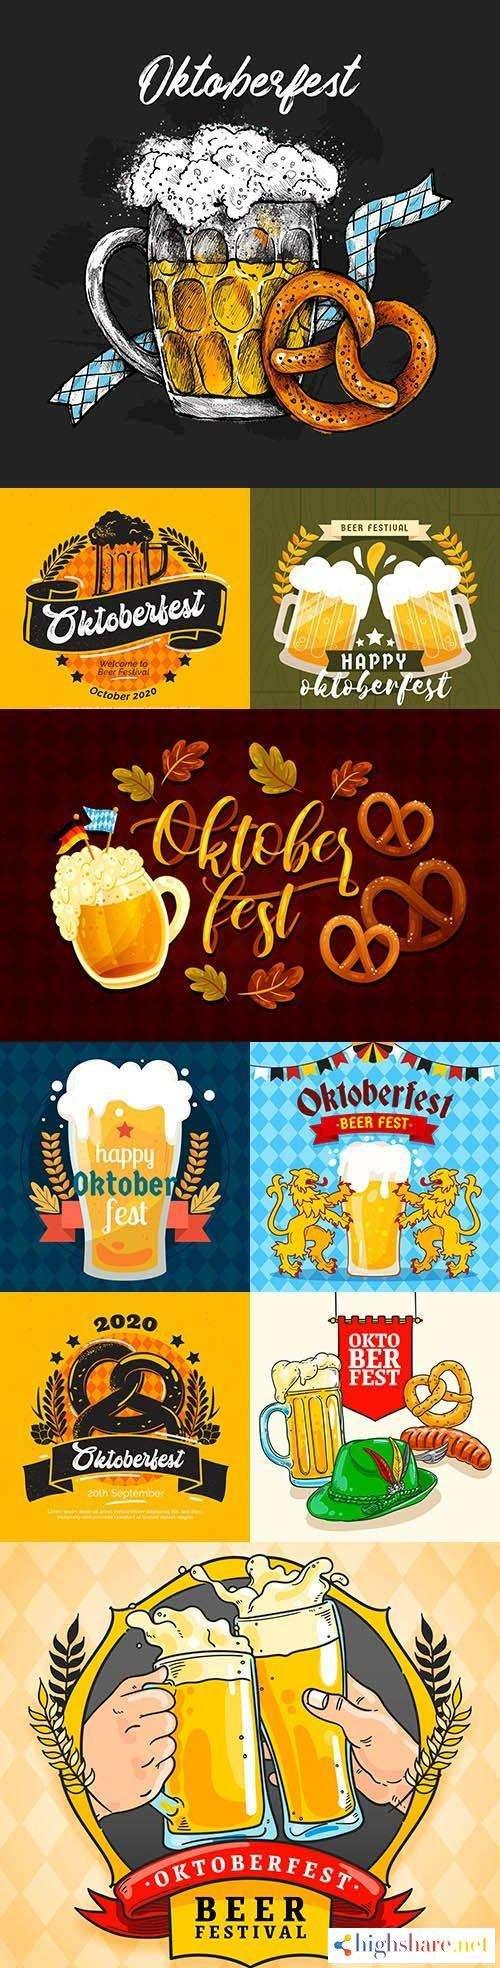 oktoberfest beer festival flat design illustration 5 5f4200c918924 - Oktoberfest Beer Festival Flat Design Illustration 5